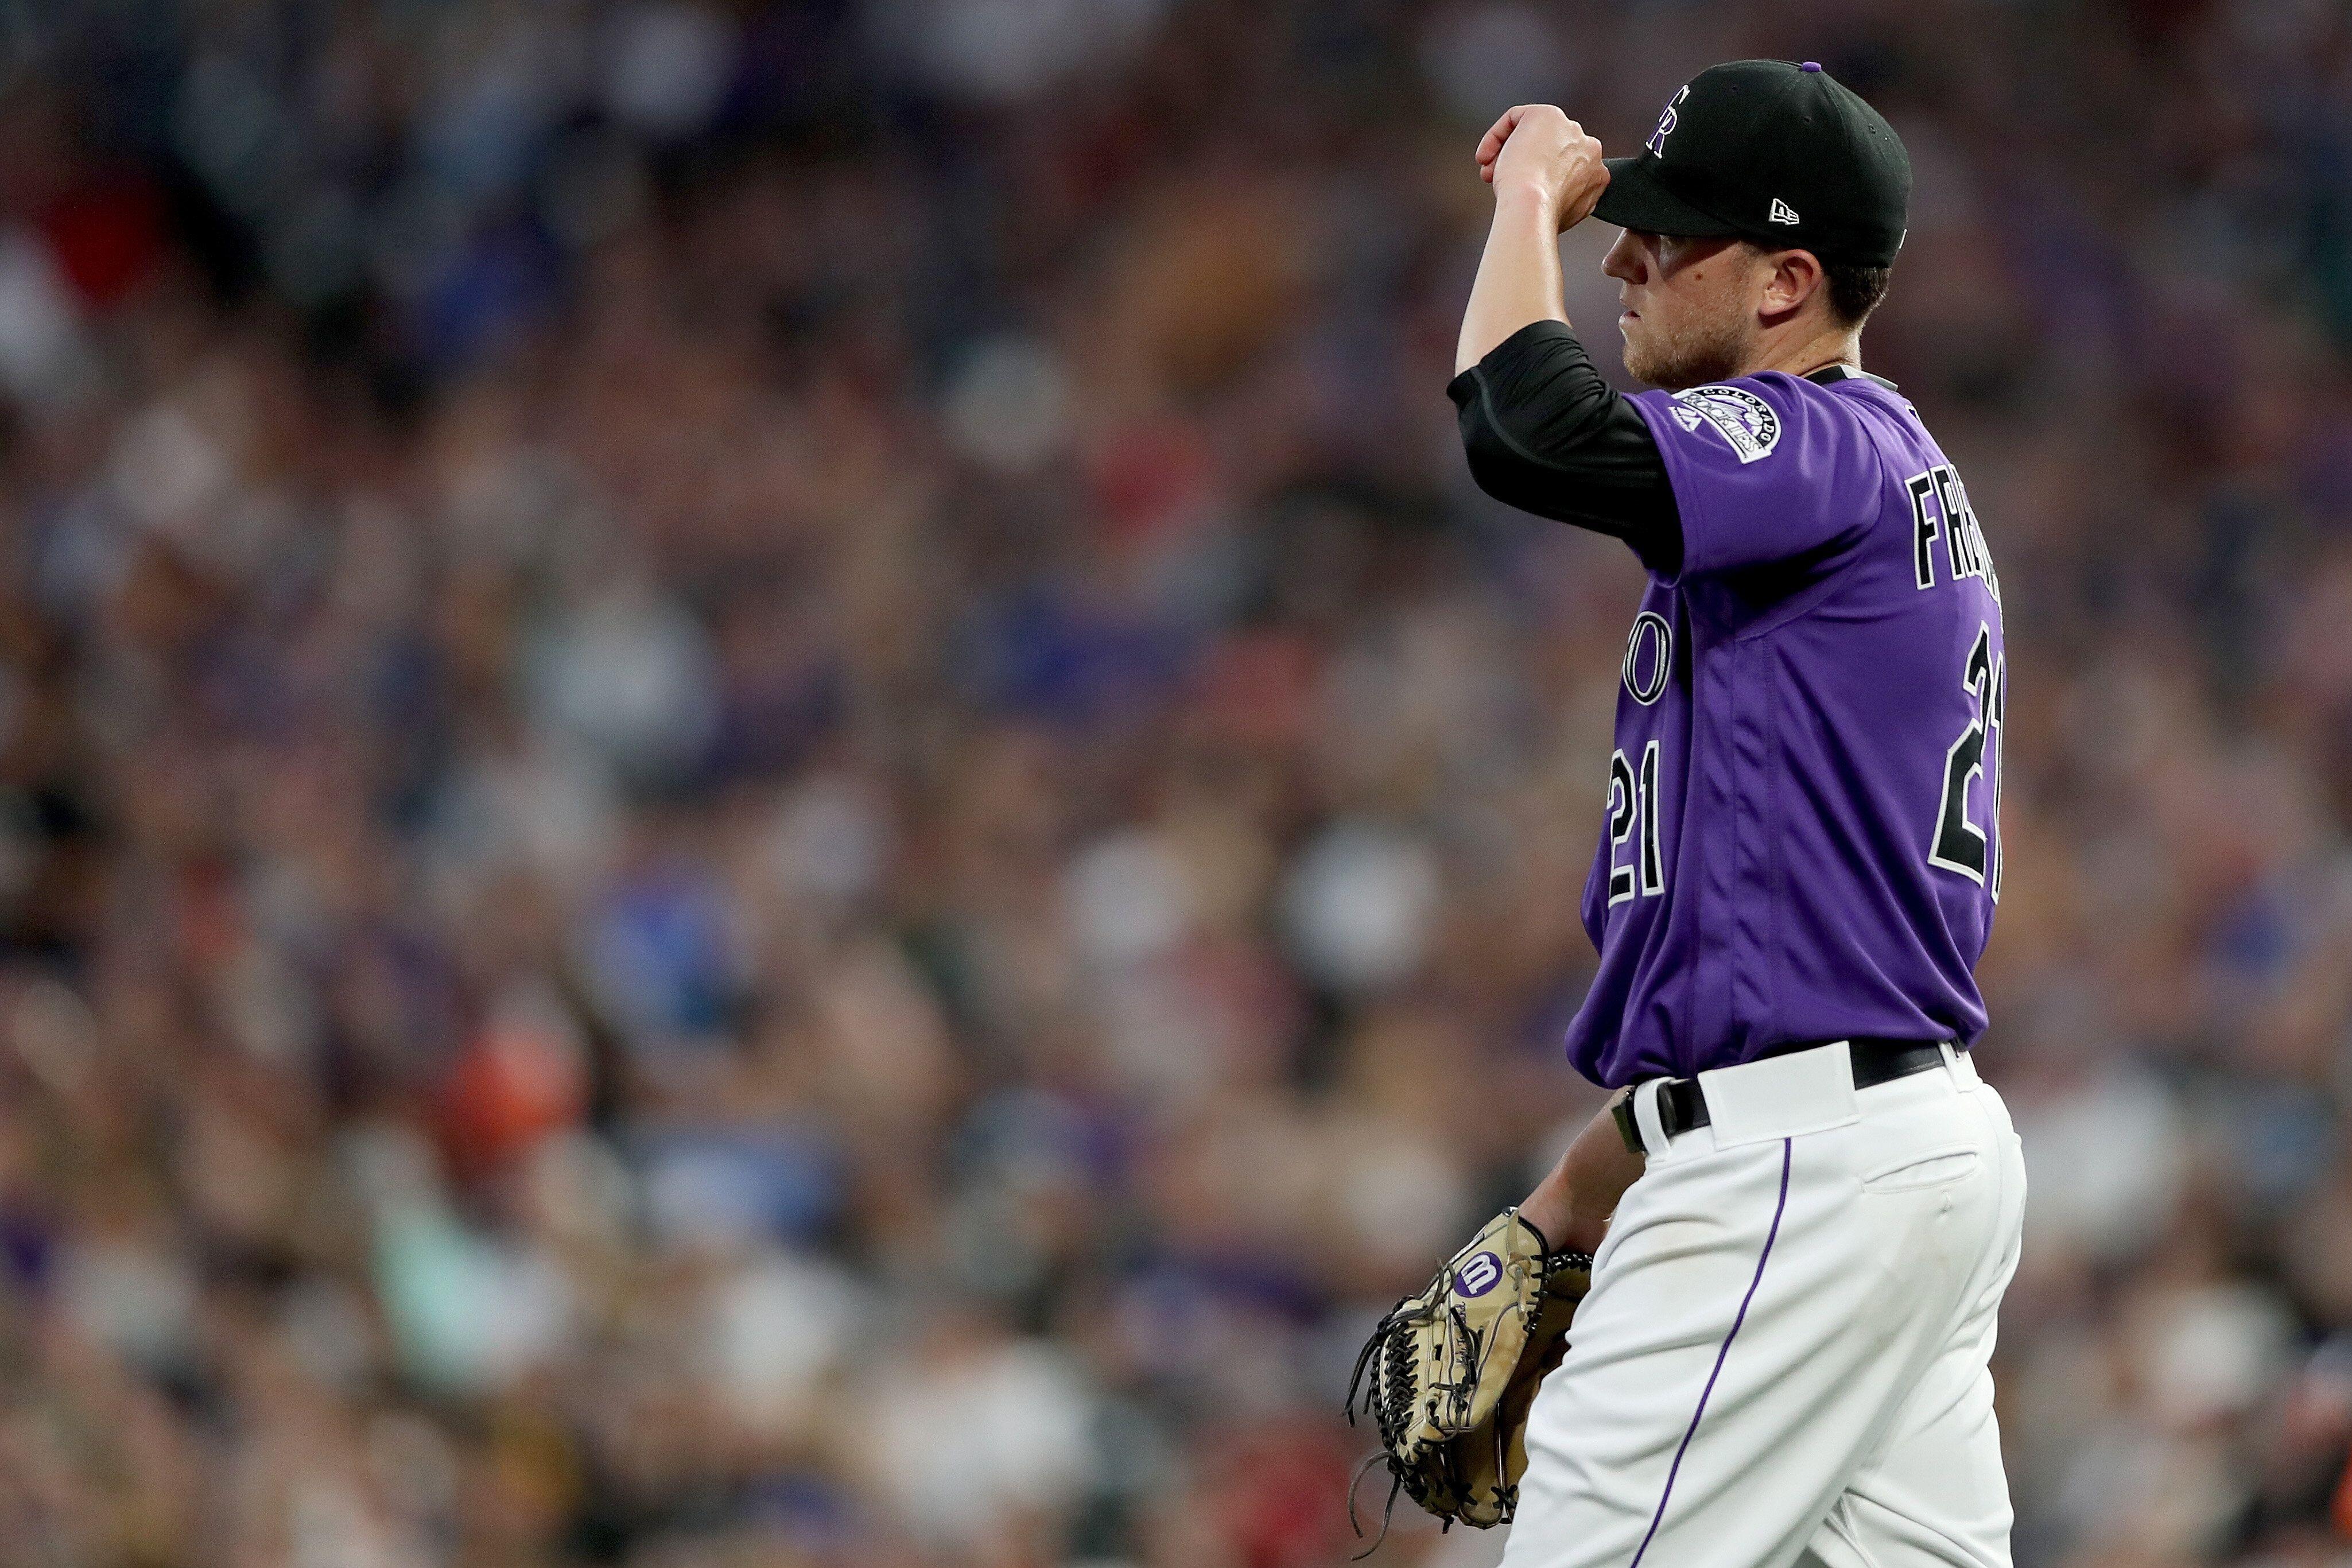 Image Credit: Yahoo Sports